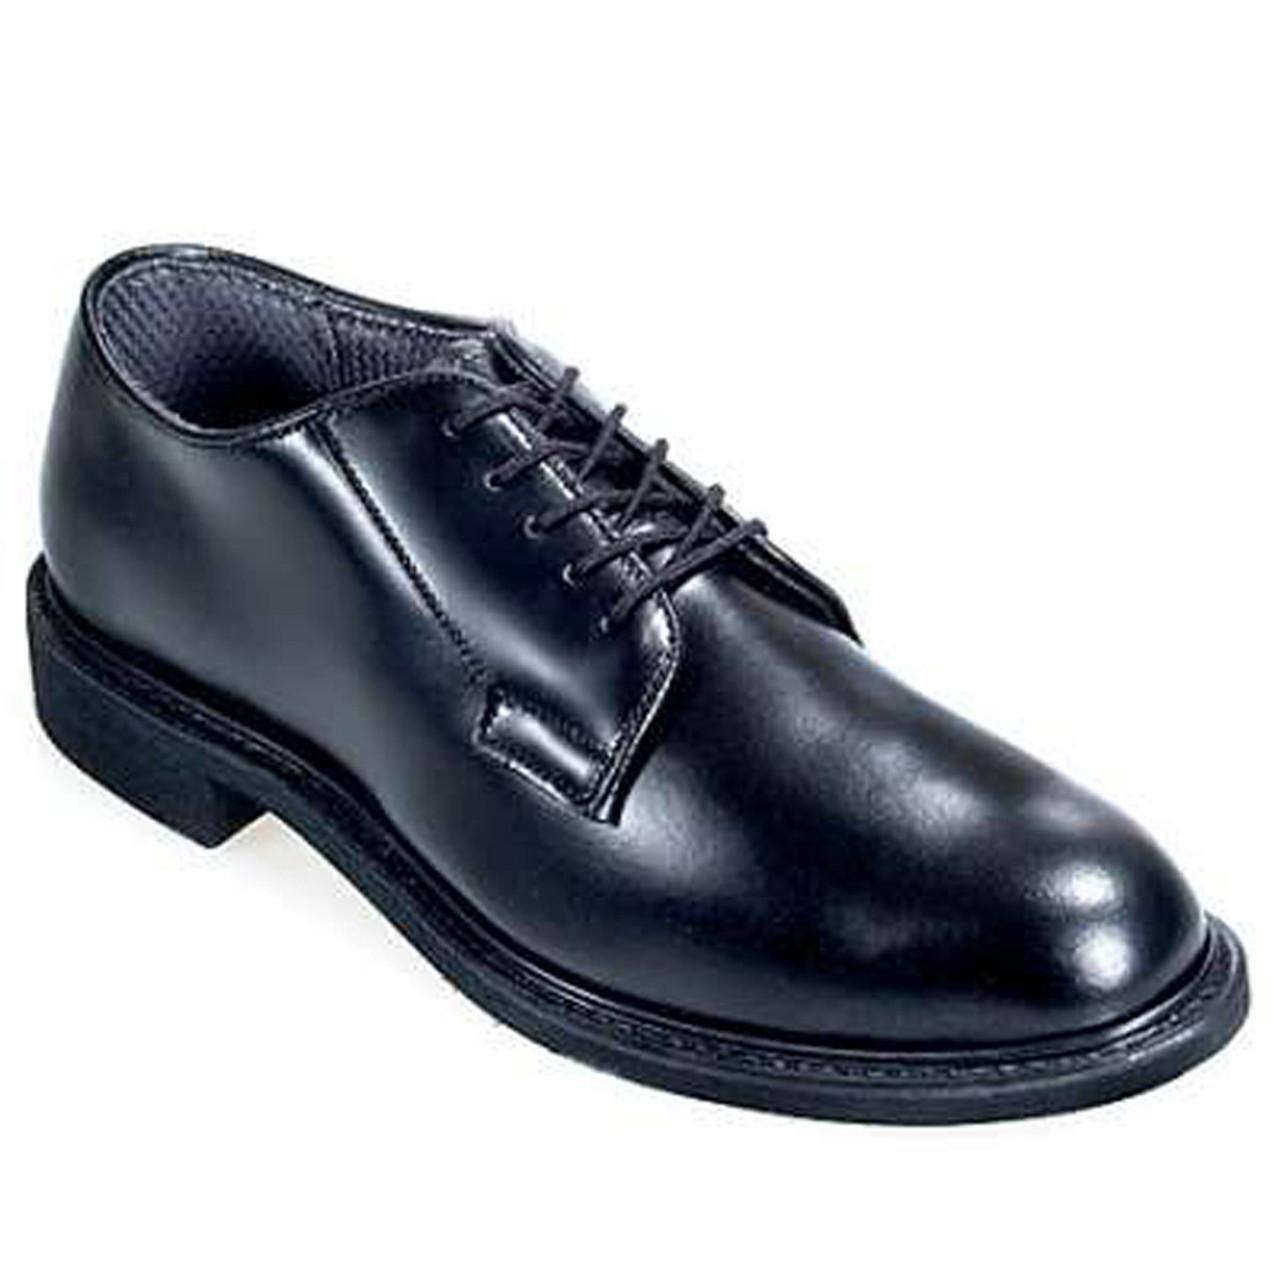 Bates 769-B Womens USA Made Black Leather Uniform Shoes - Boots Plus ... 5255c530a